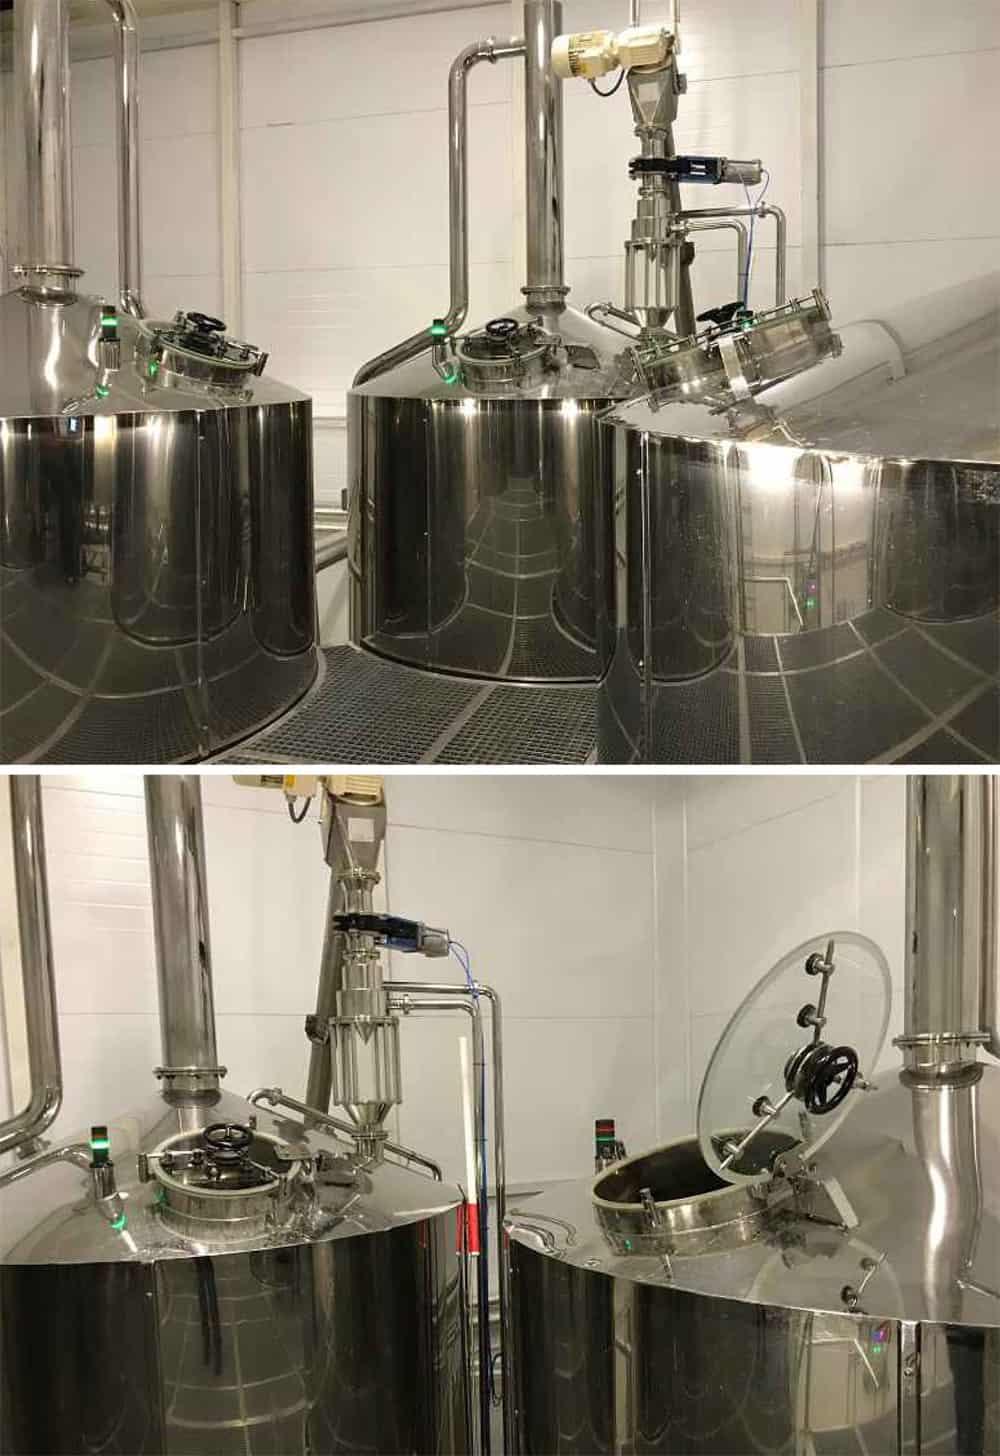 BH BWOP 6000 photo brewhouse 01 - BREWORX OPPIDUM 6000 : Wort brew machine - the brewhouse - bop, bwm-bop